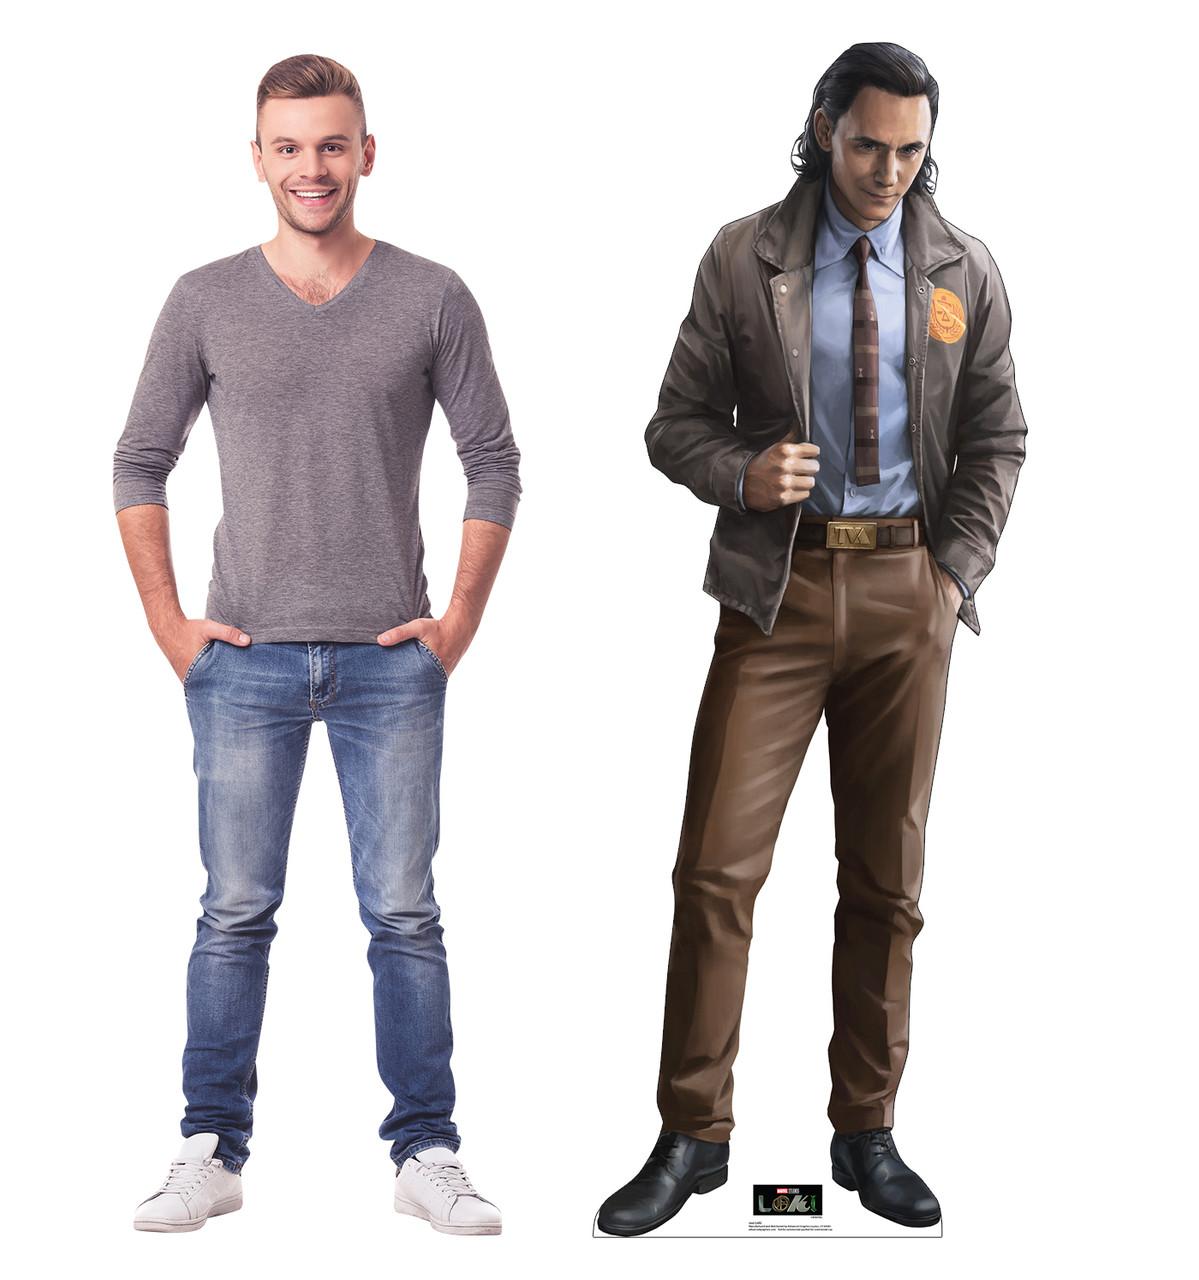 Life-size cardboard standee of Loki from Marvel/Disney+ series Loki with model.